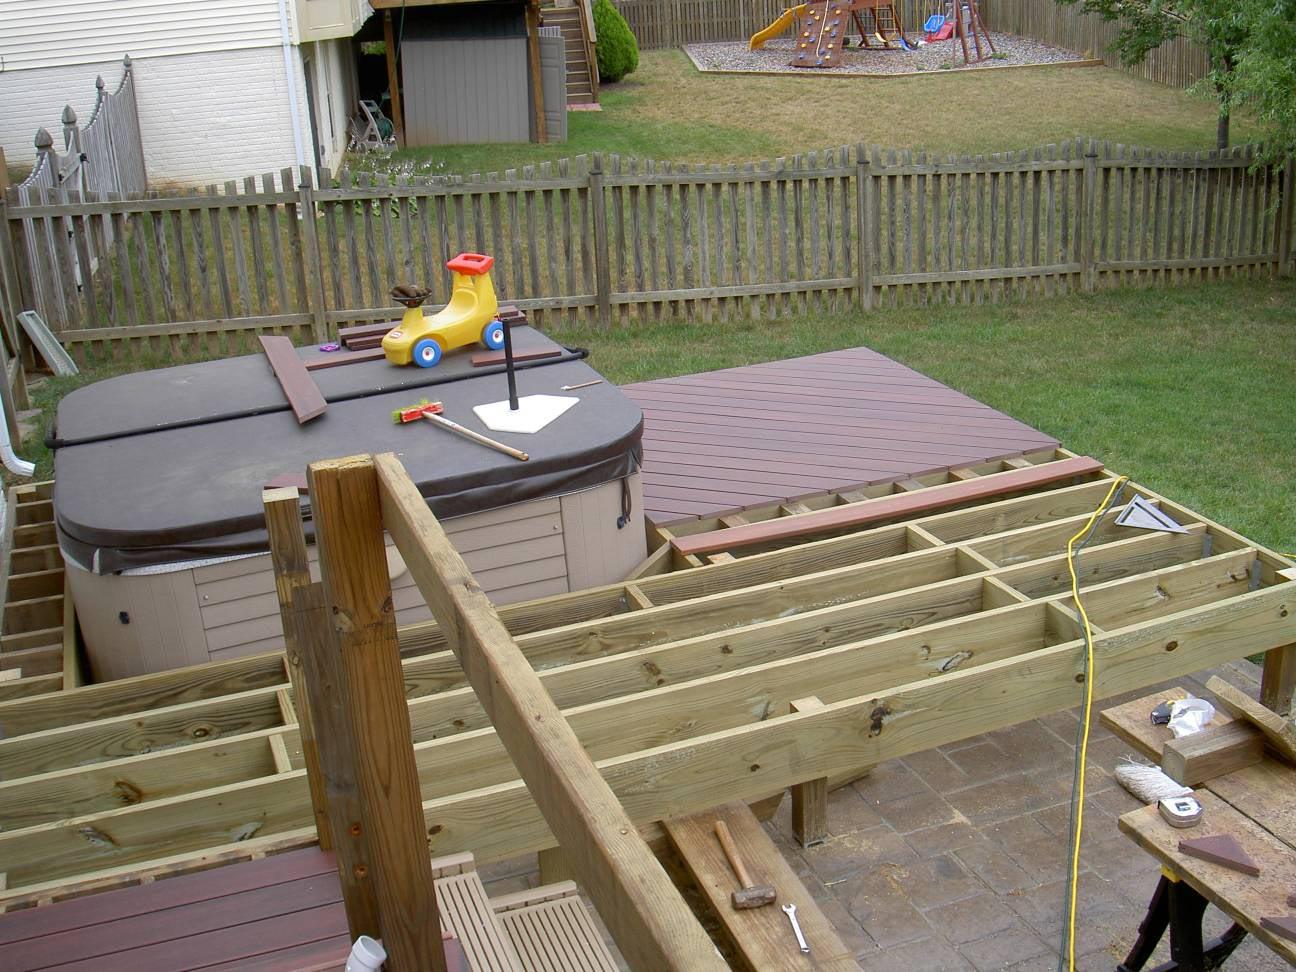 In Deck Hot Tub Backyard Design Ideas in dimensions 1296 X 972